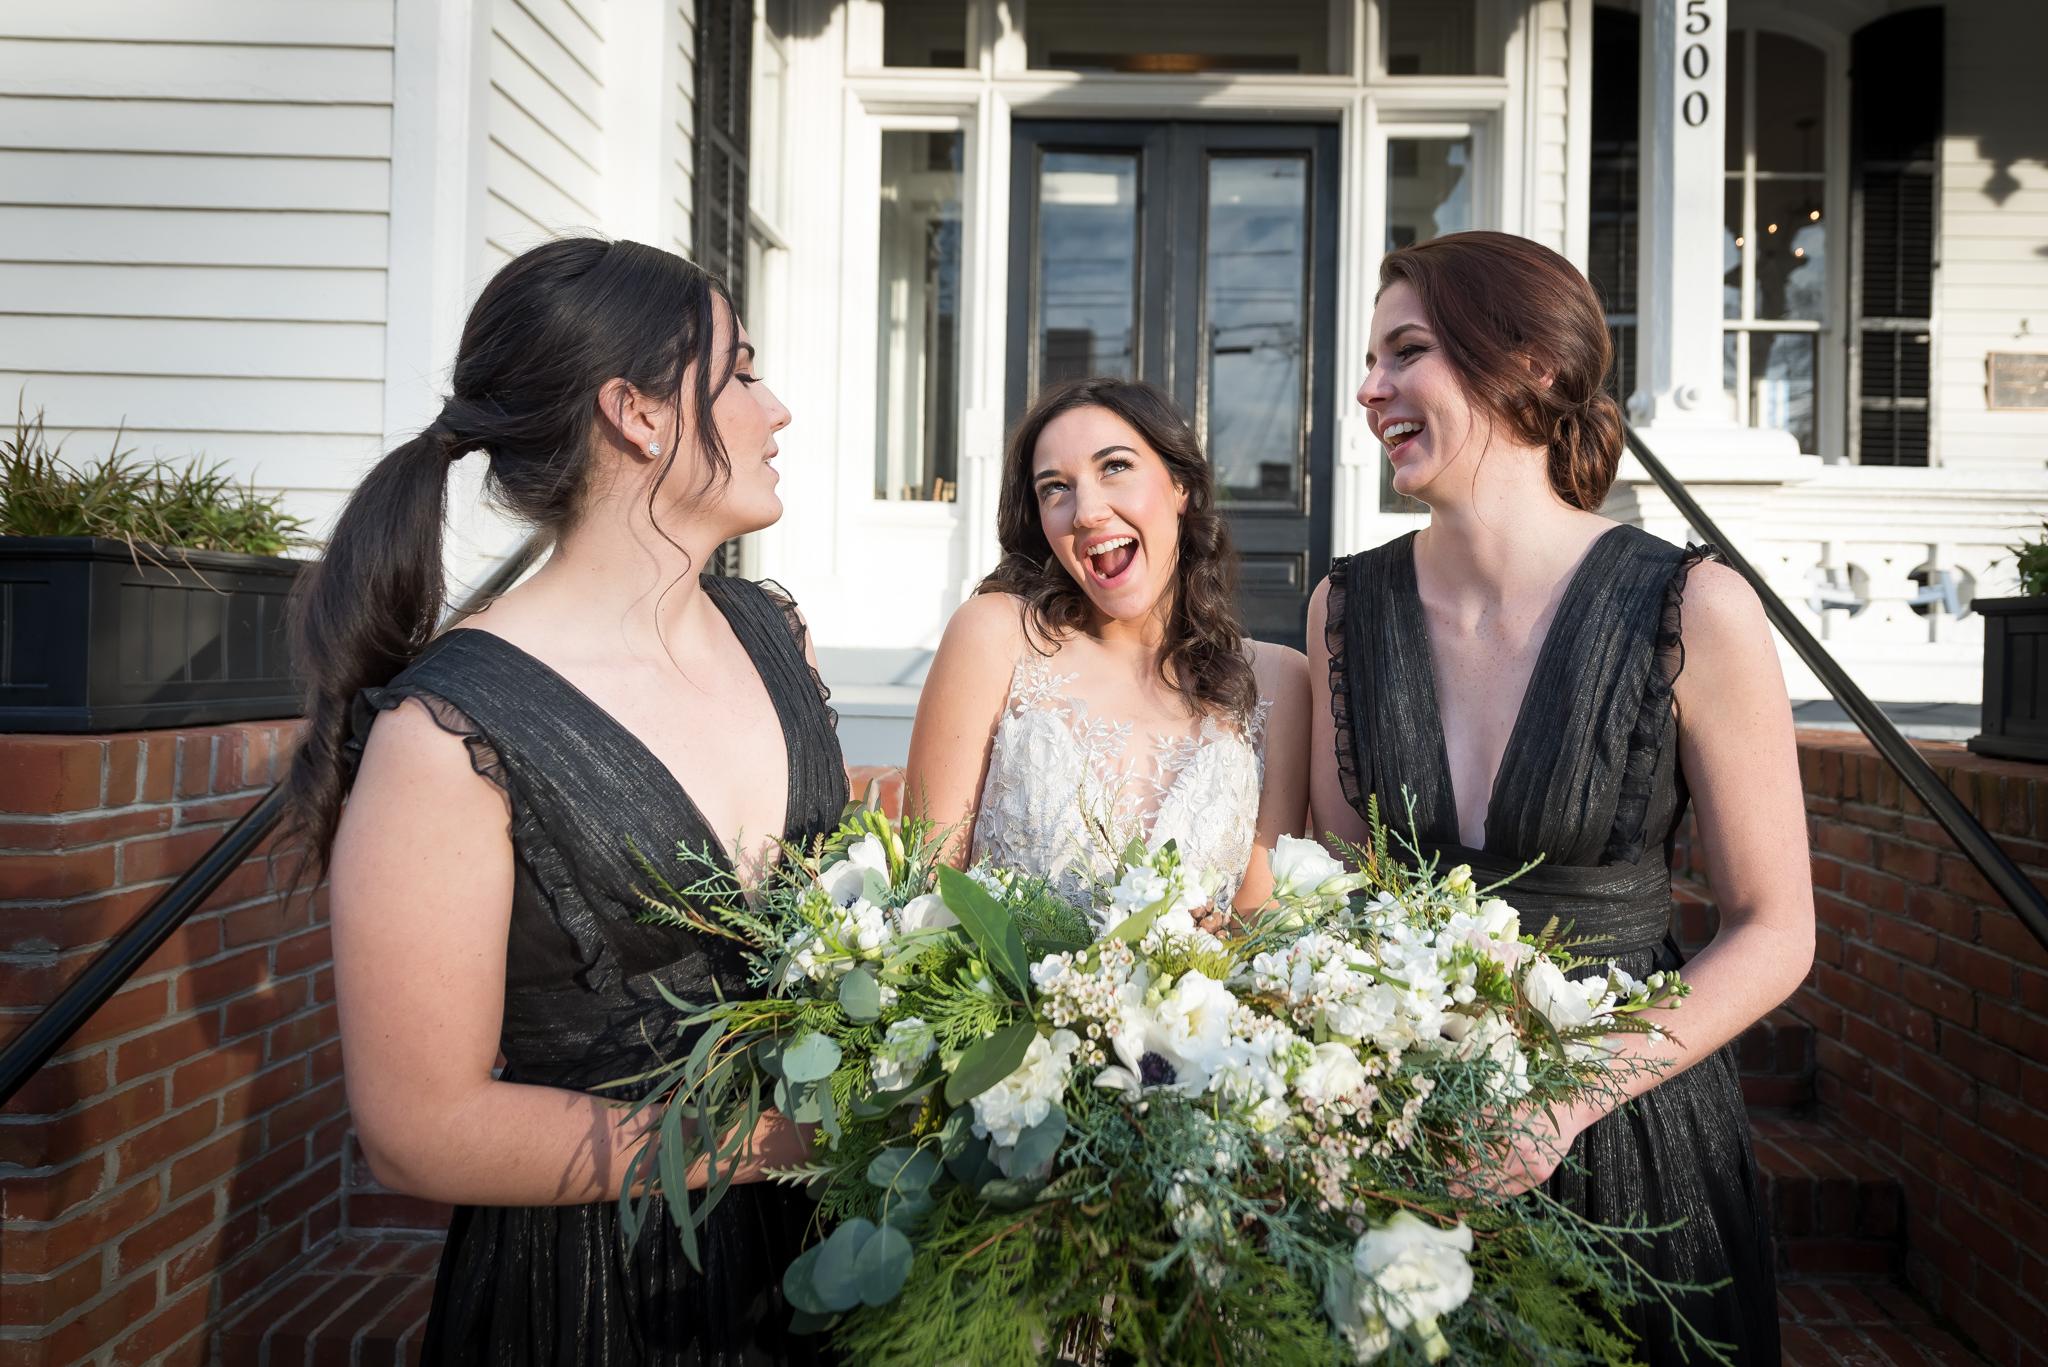 merrimon-wynne-wedding-photography-021.jpg